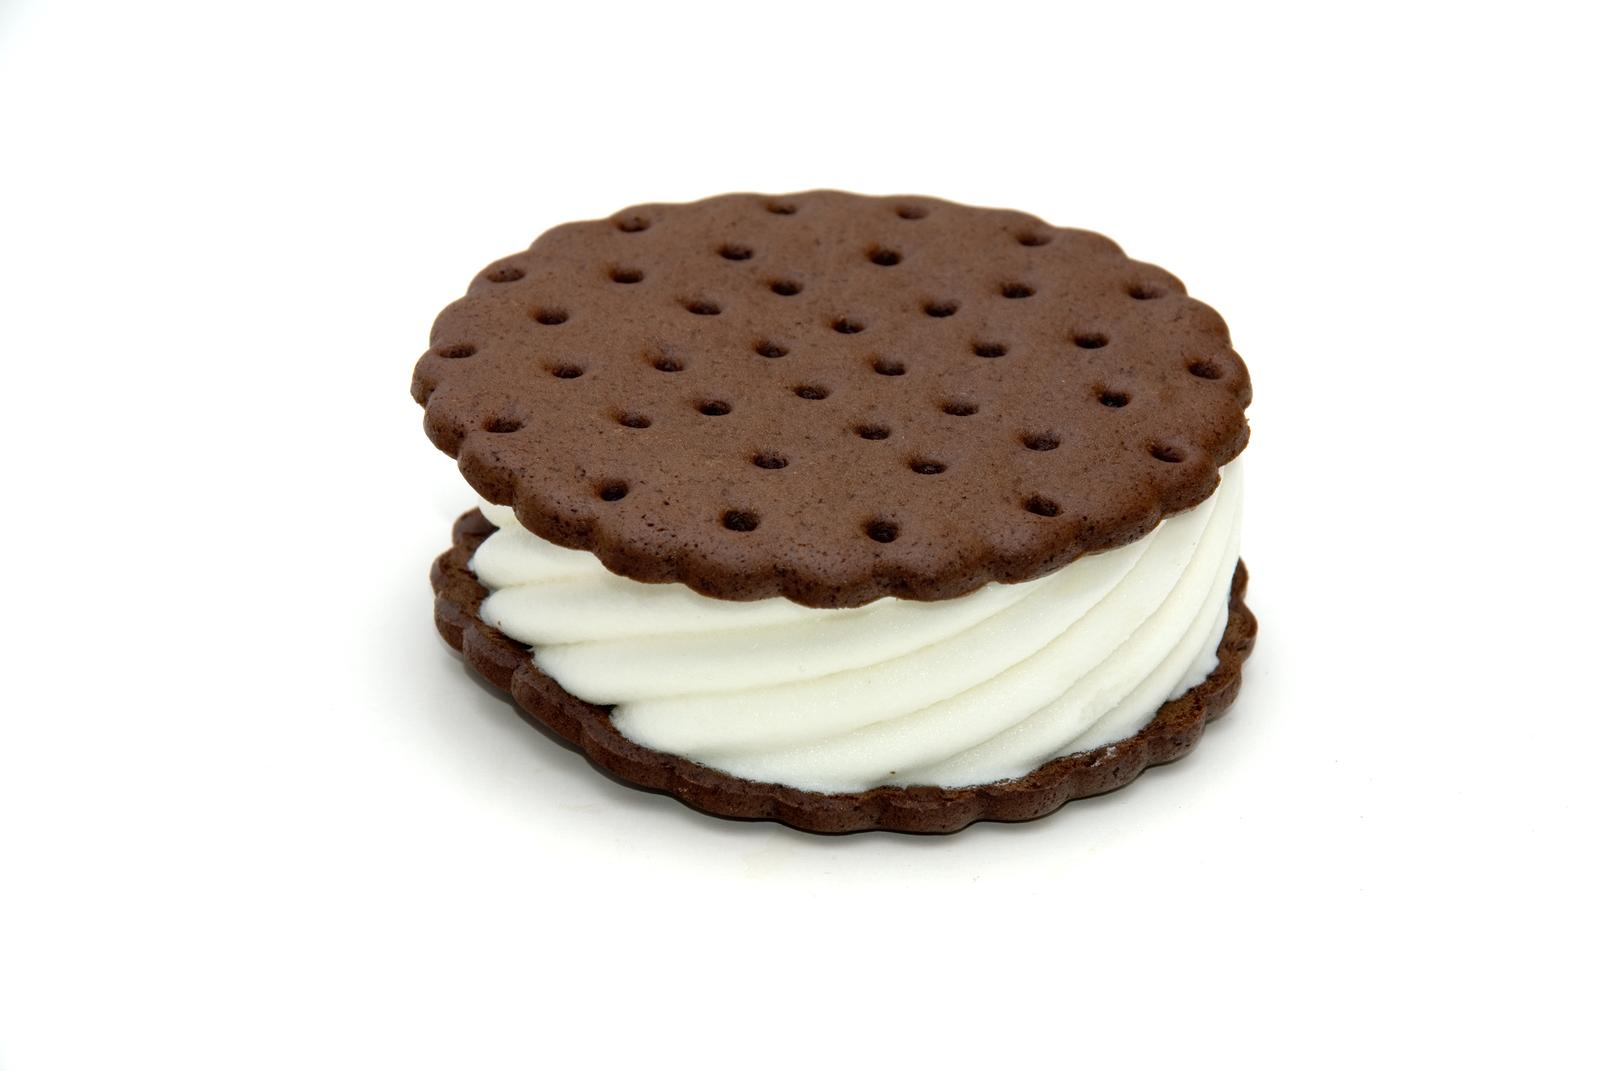 ice cream sandwich blank template imgflip